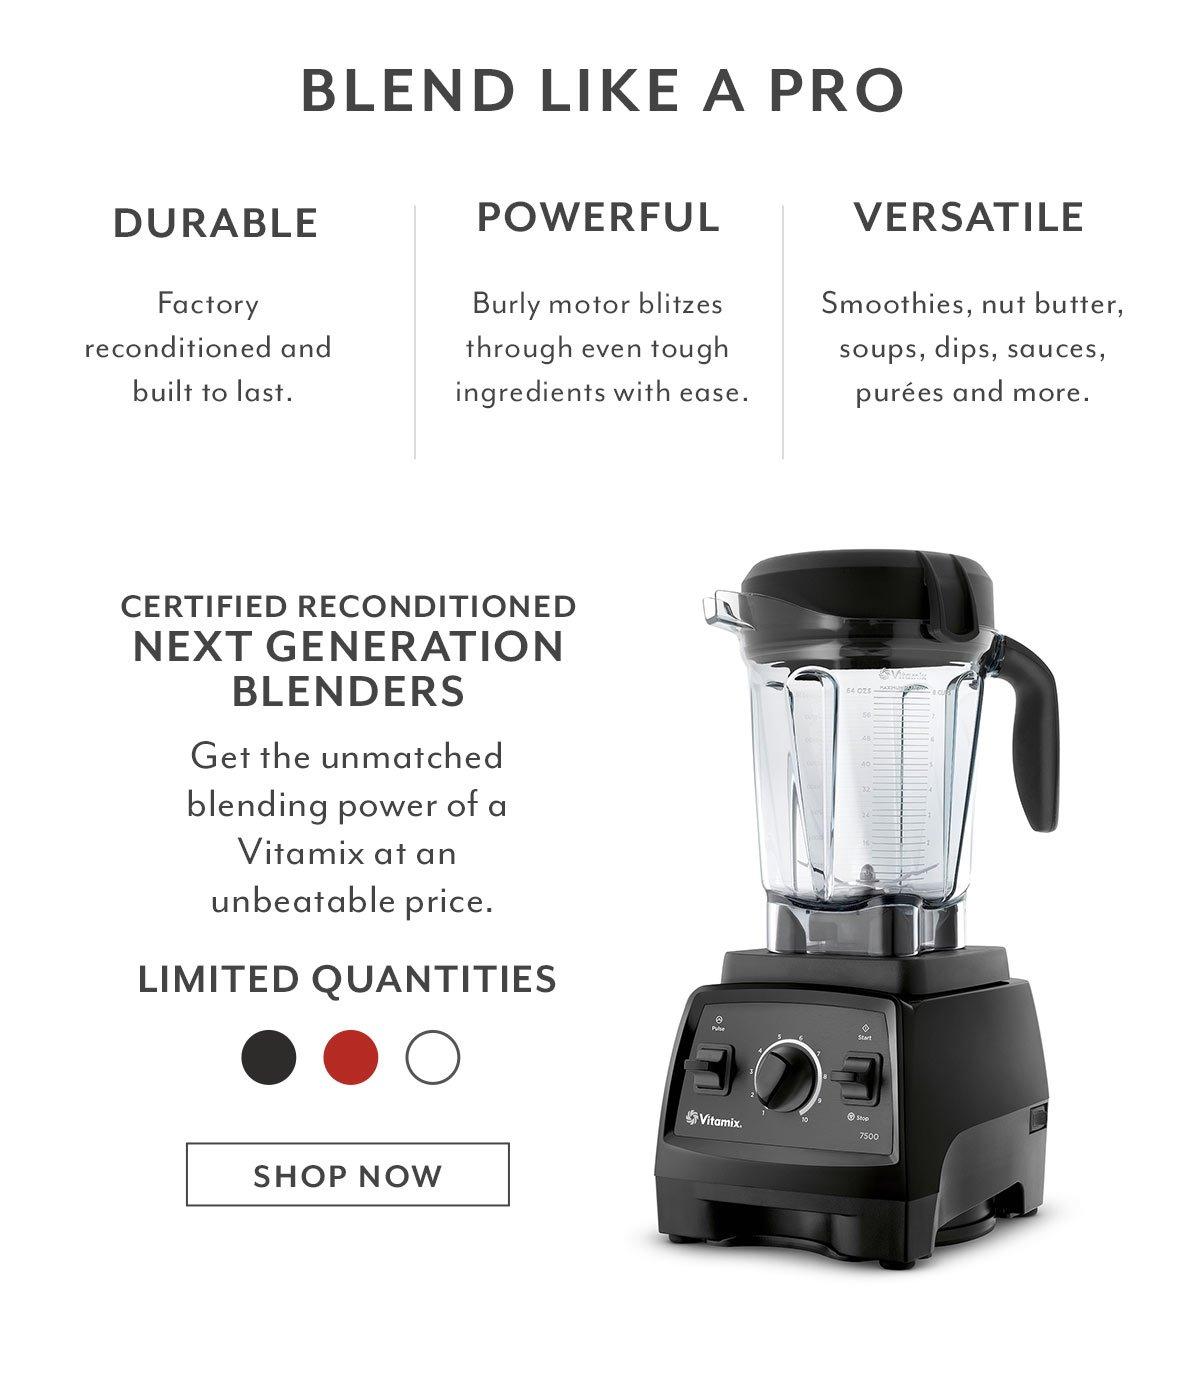 Recon Vitamix 5300 Blender